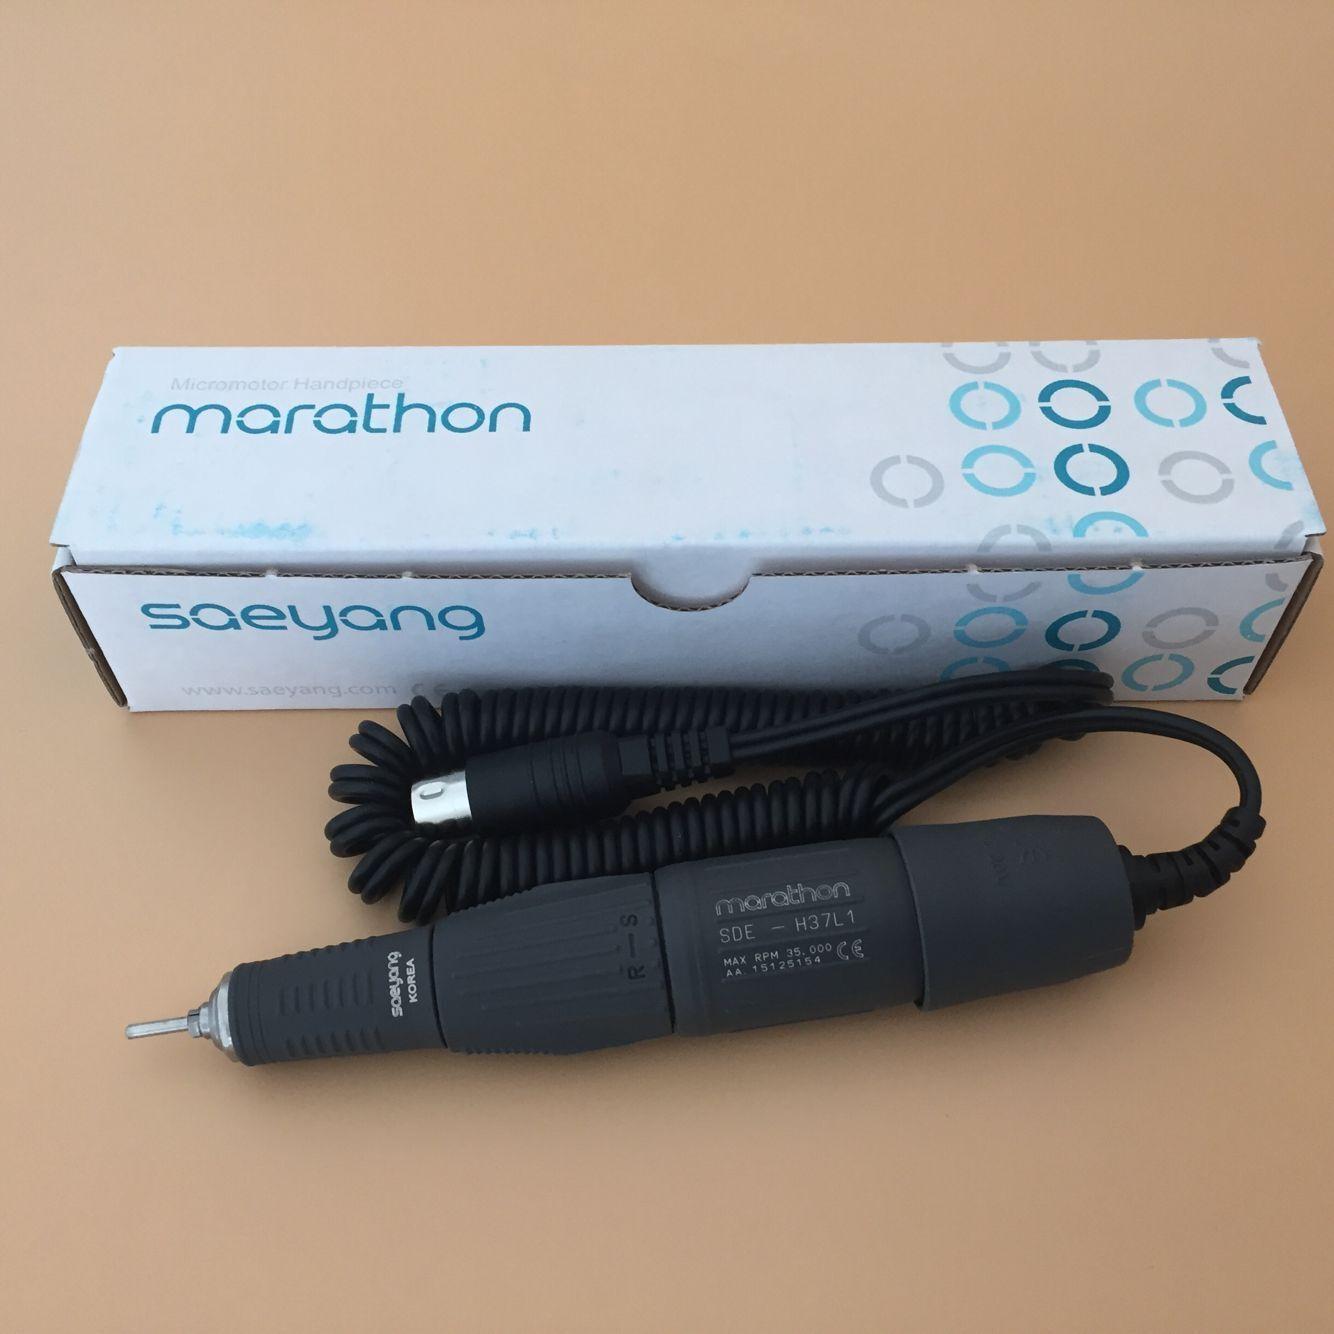 Dental Marathon Lab Elettrico Micromotore Manipolo per la Lucidatura 35 K RPM